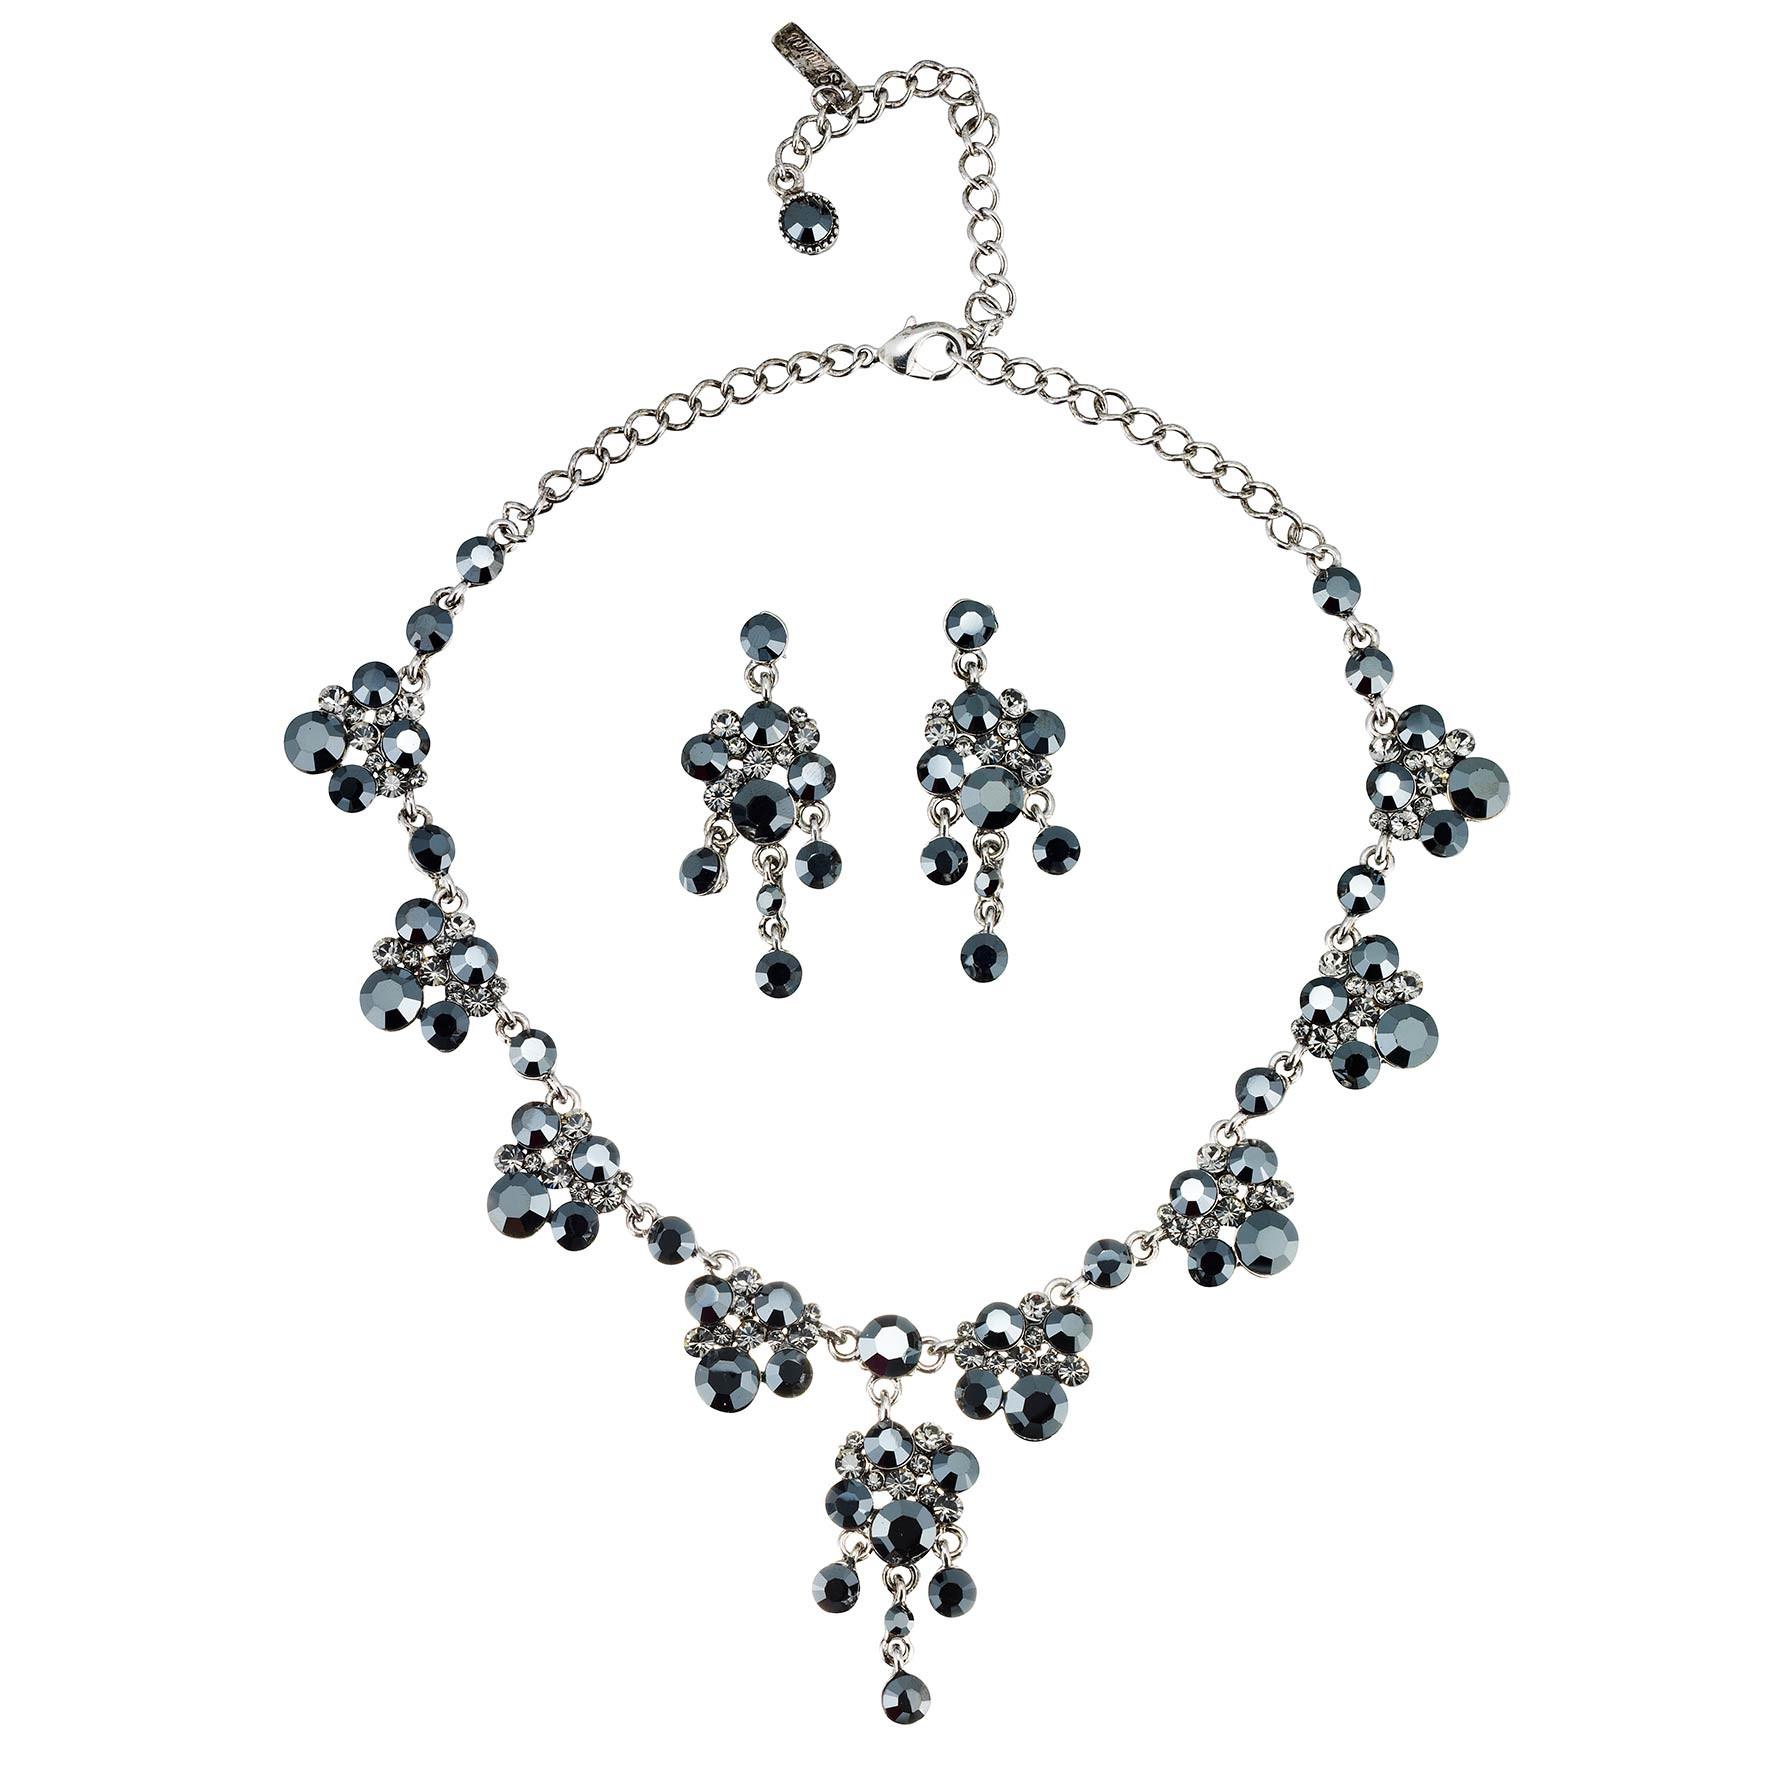 Swarovski Crystal Black Crystal Necklace And Earring Set